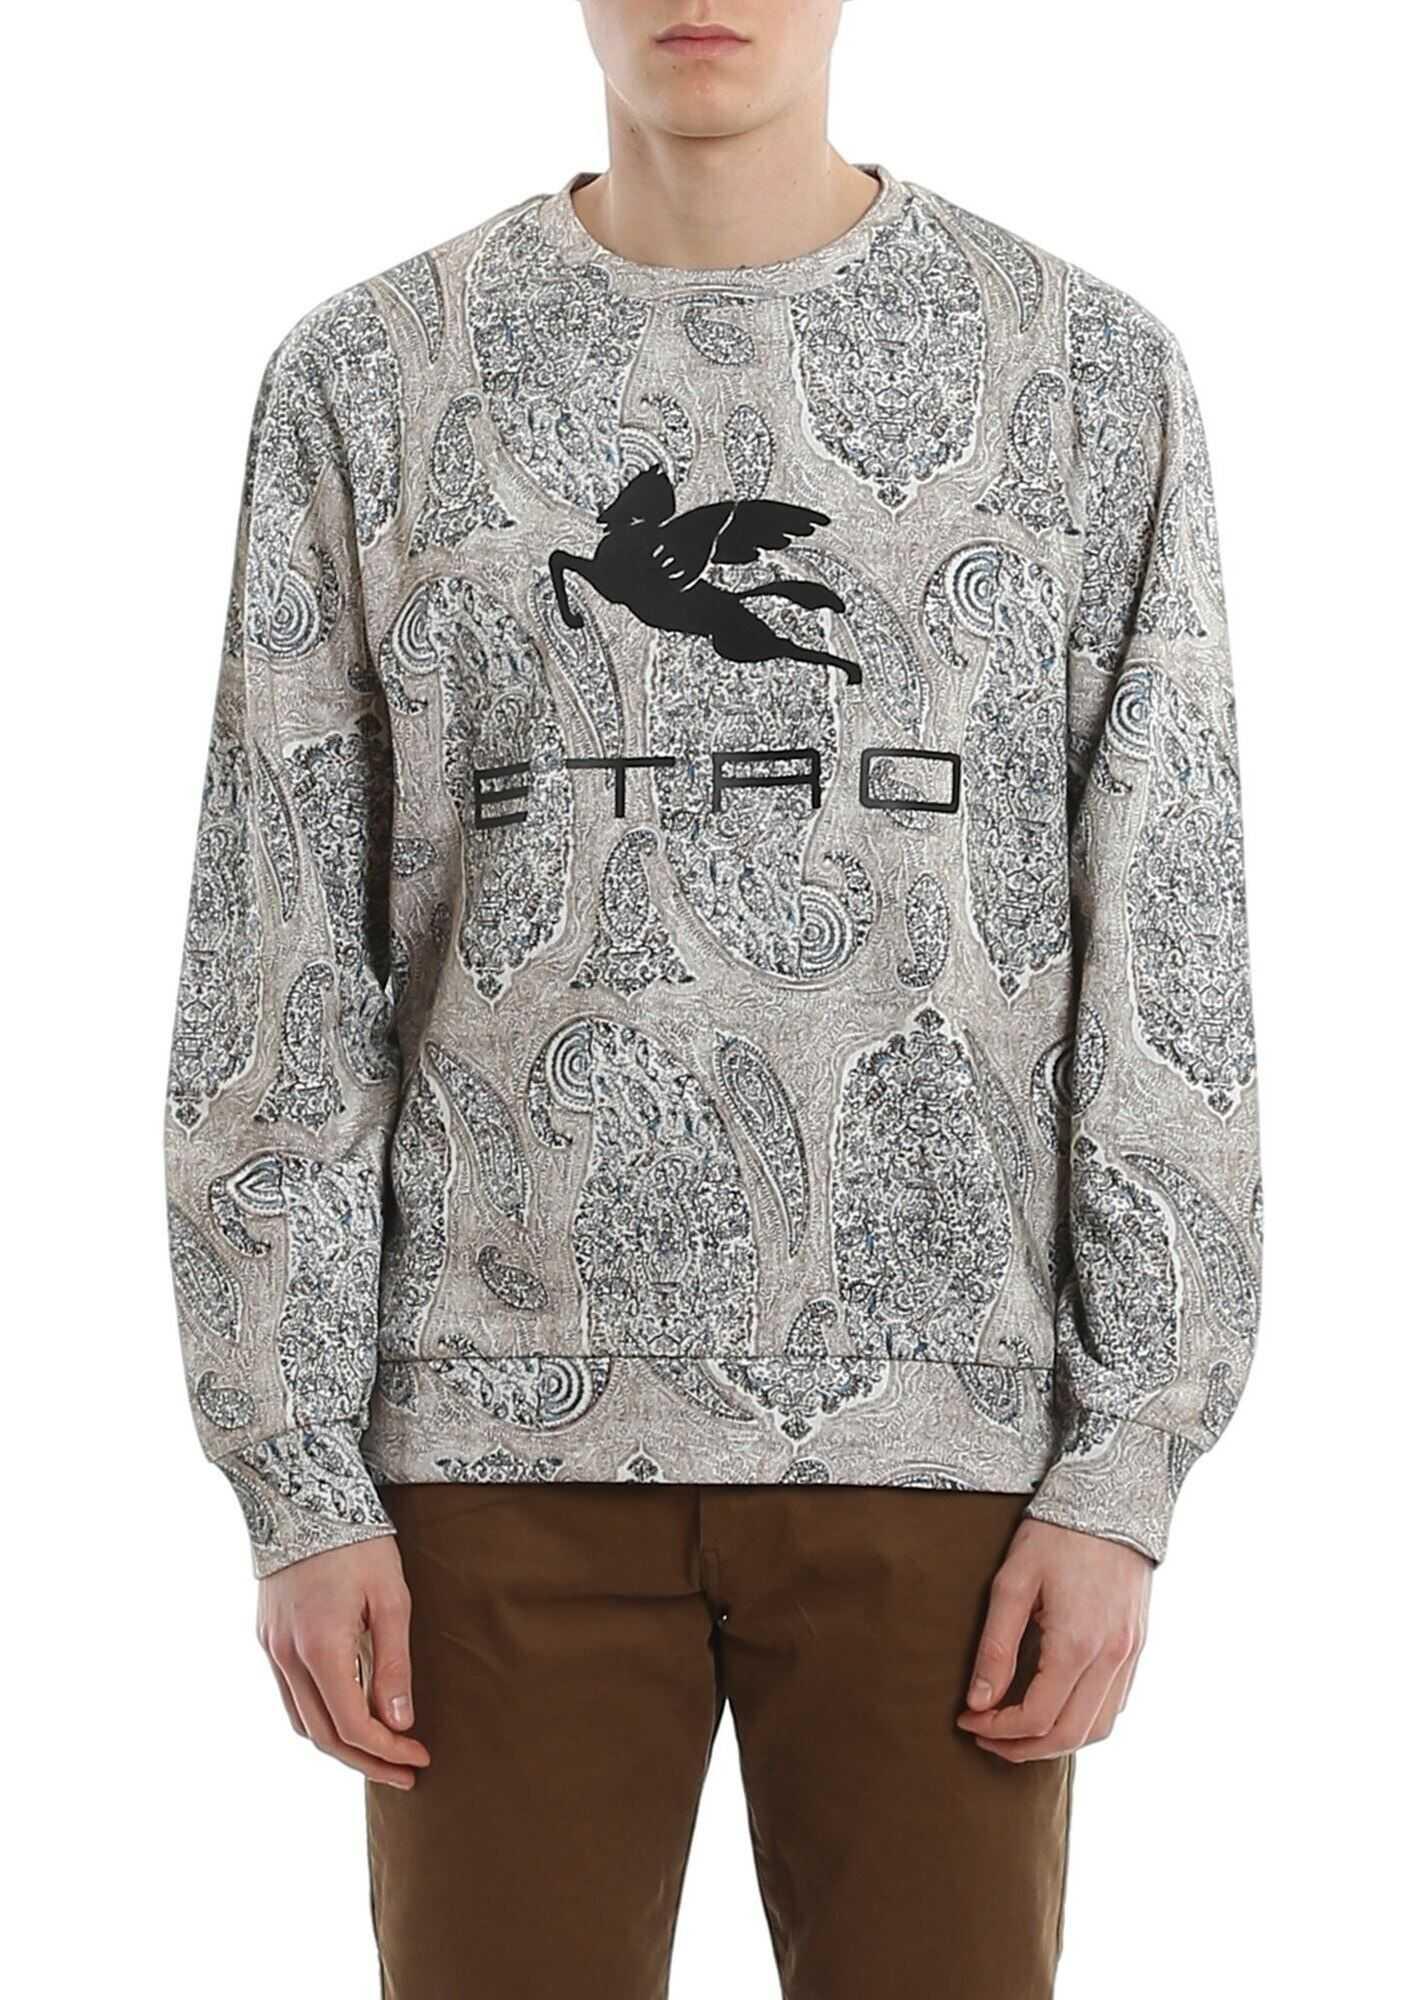 ETRO Paisley Patterned Techno Cotton Sweatshirt Beige imagine